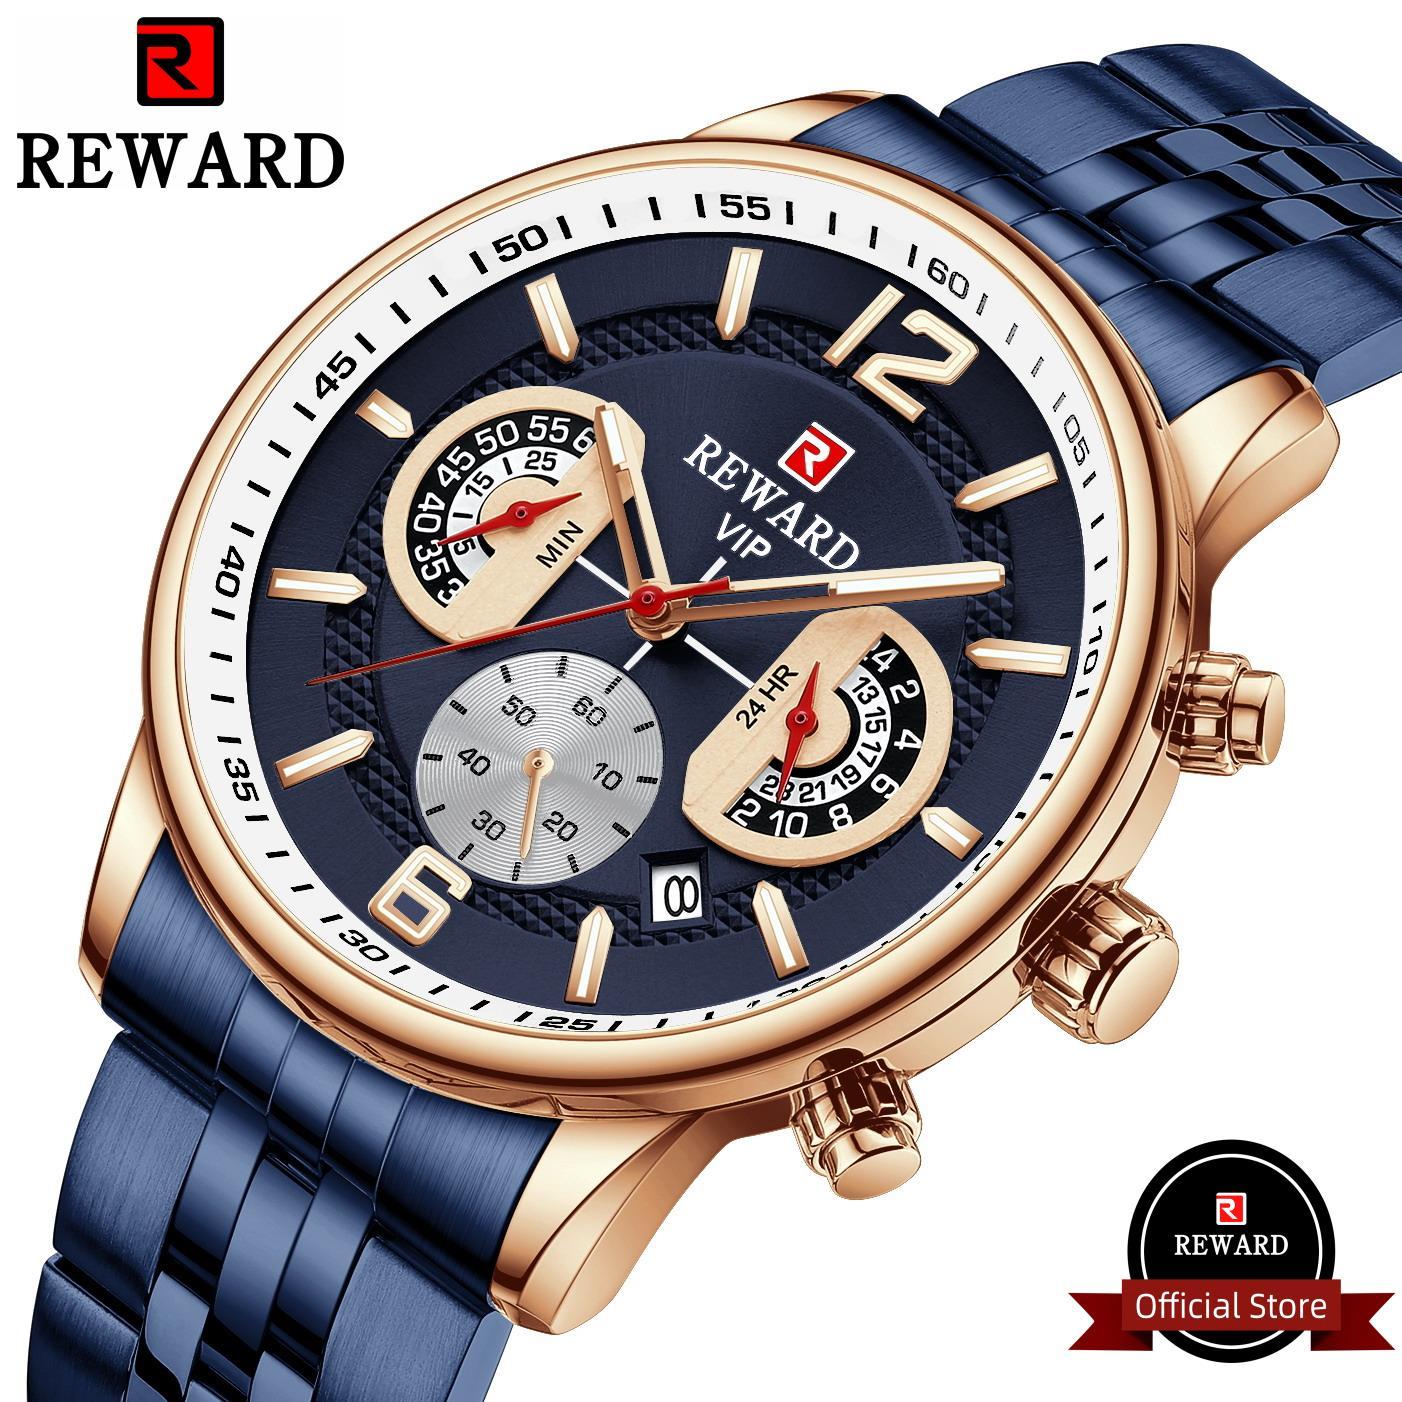 watches mens 2020 luxury sport watch watch for men casual watch waterproof wrist watch for men's qua